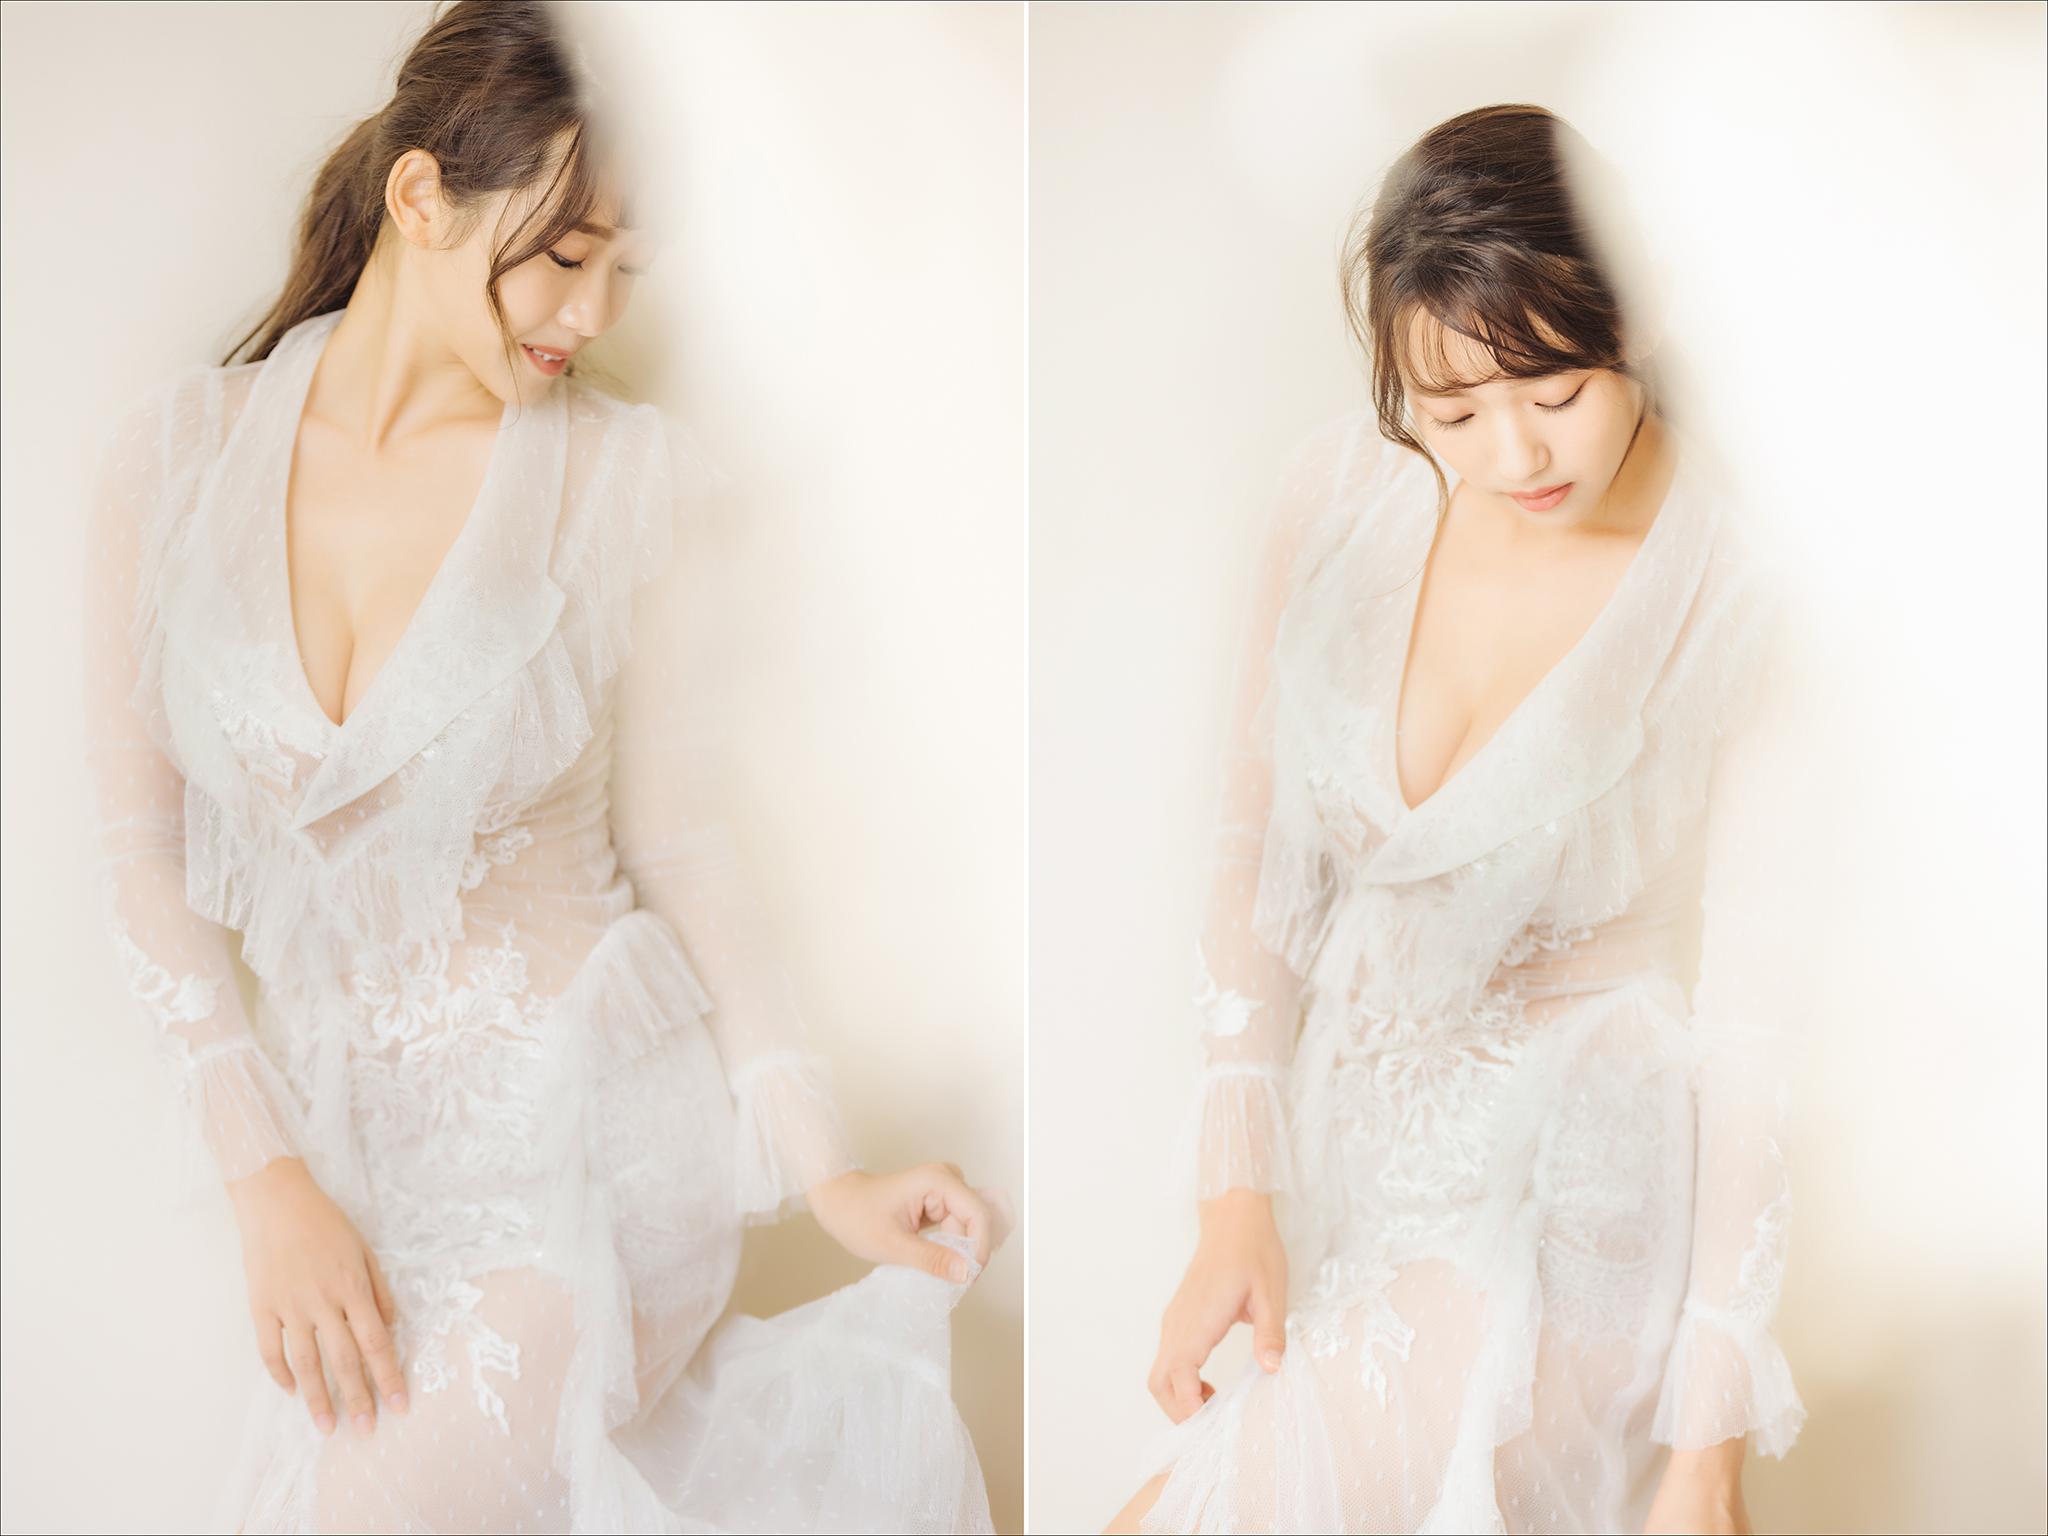 51578370850 13980f92e1 o - 【自主婚紗】+江jiang+